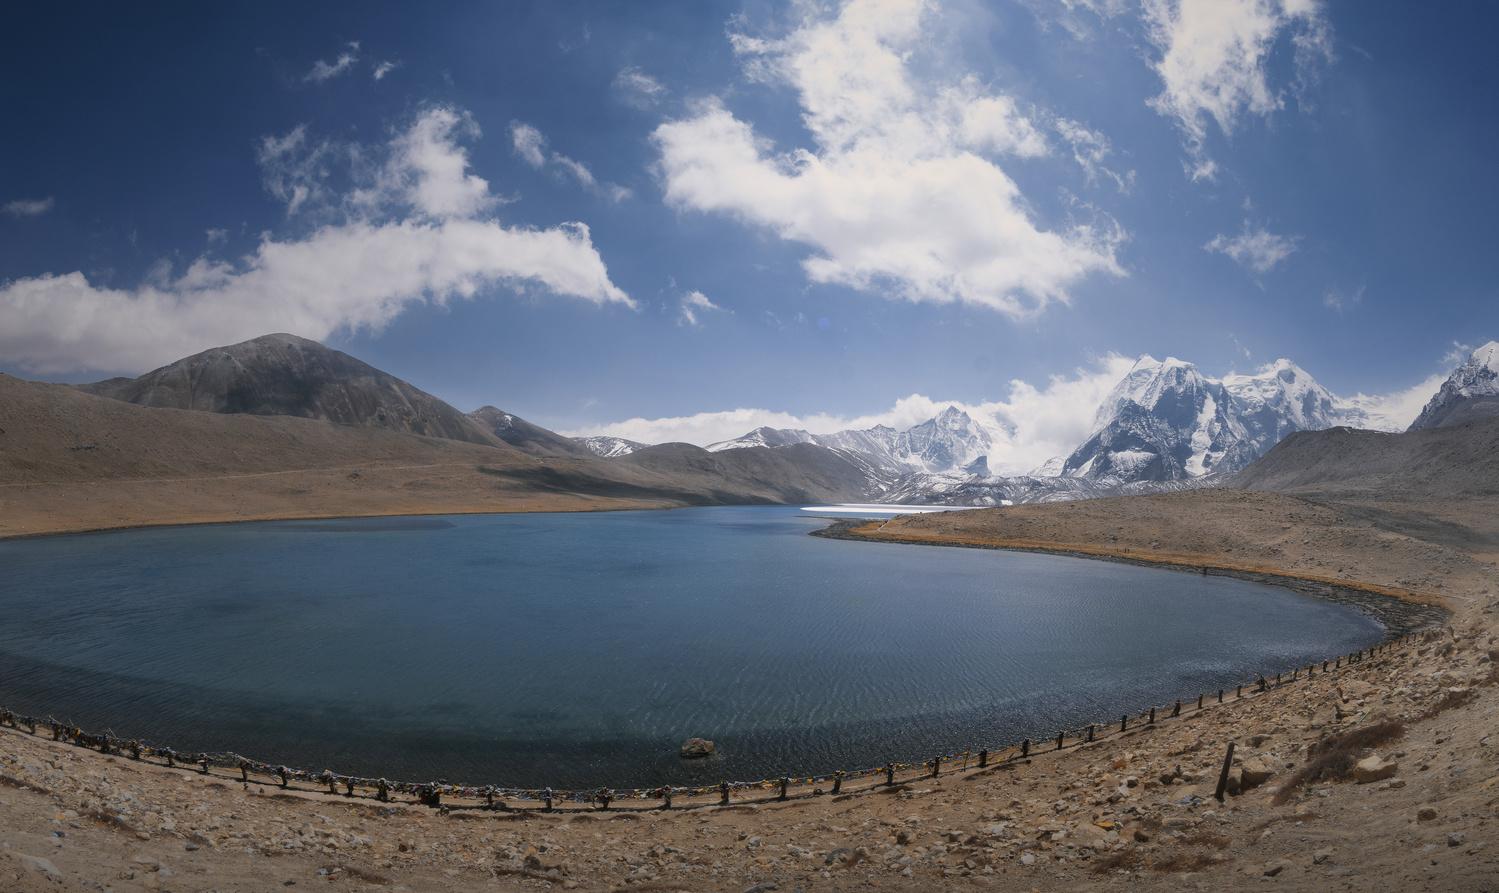 Gurudongmar Lake by Subhadip Saha